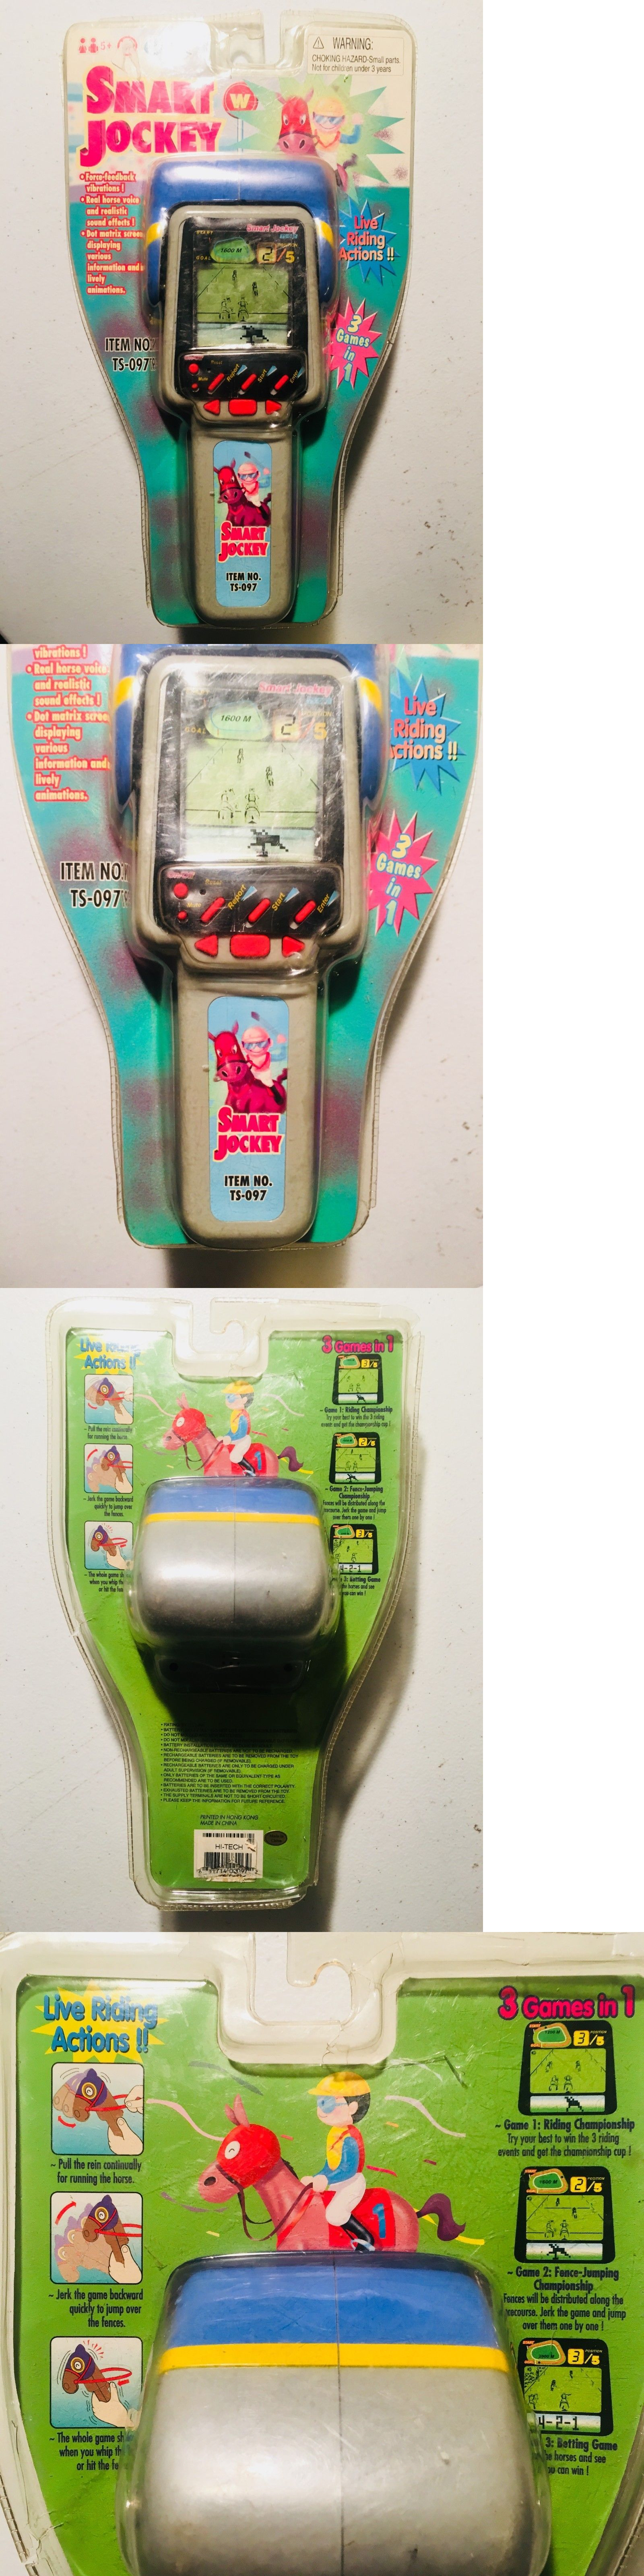 Giga Pets 158701 Rare! Smart Jockey Handheld Electronic